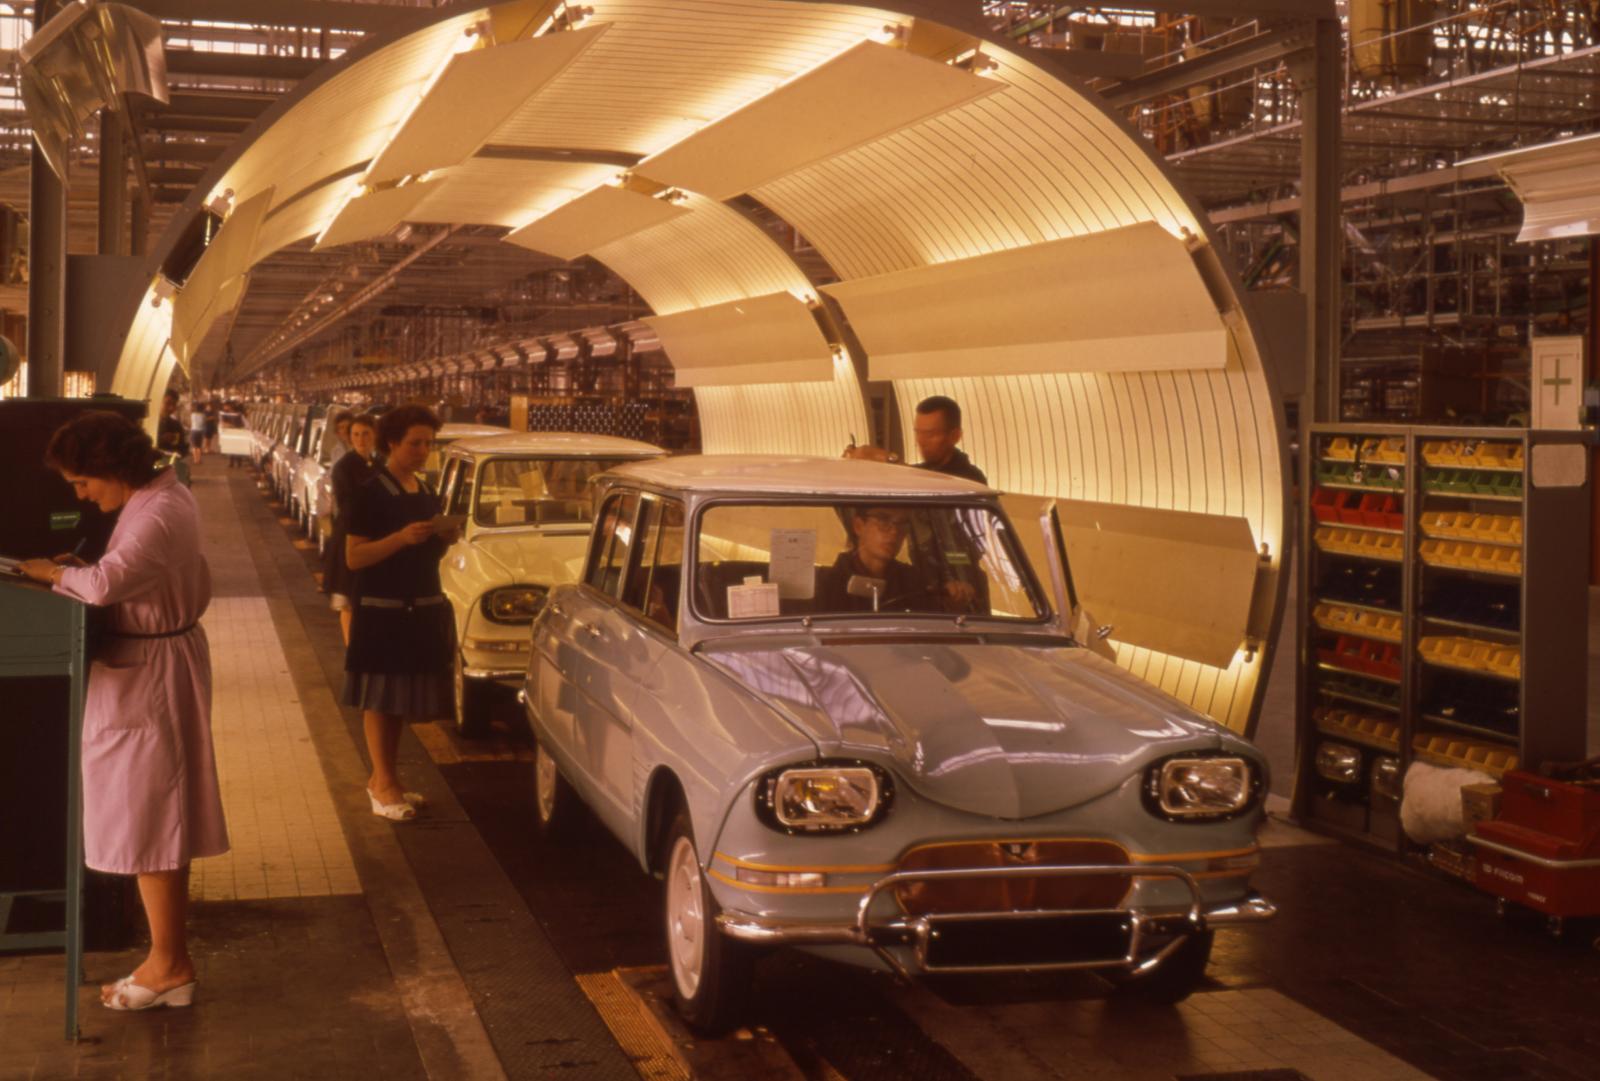 Tunnel de contrôle AMI 6 Rennes